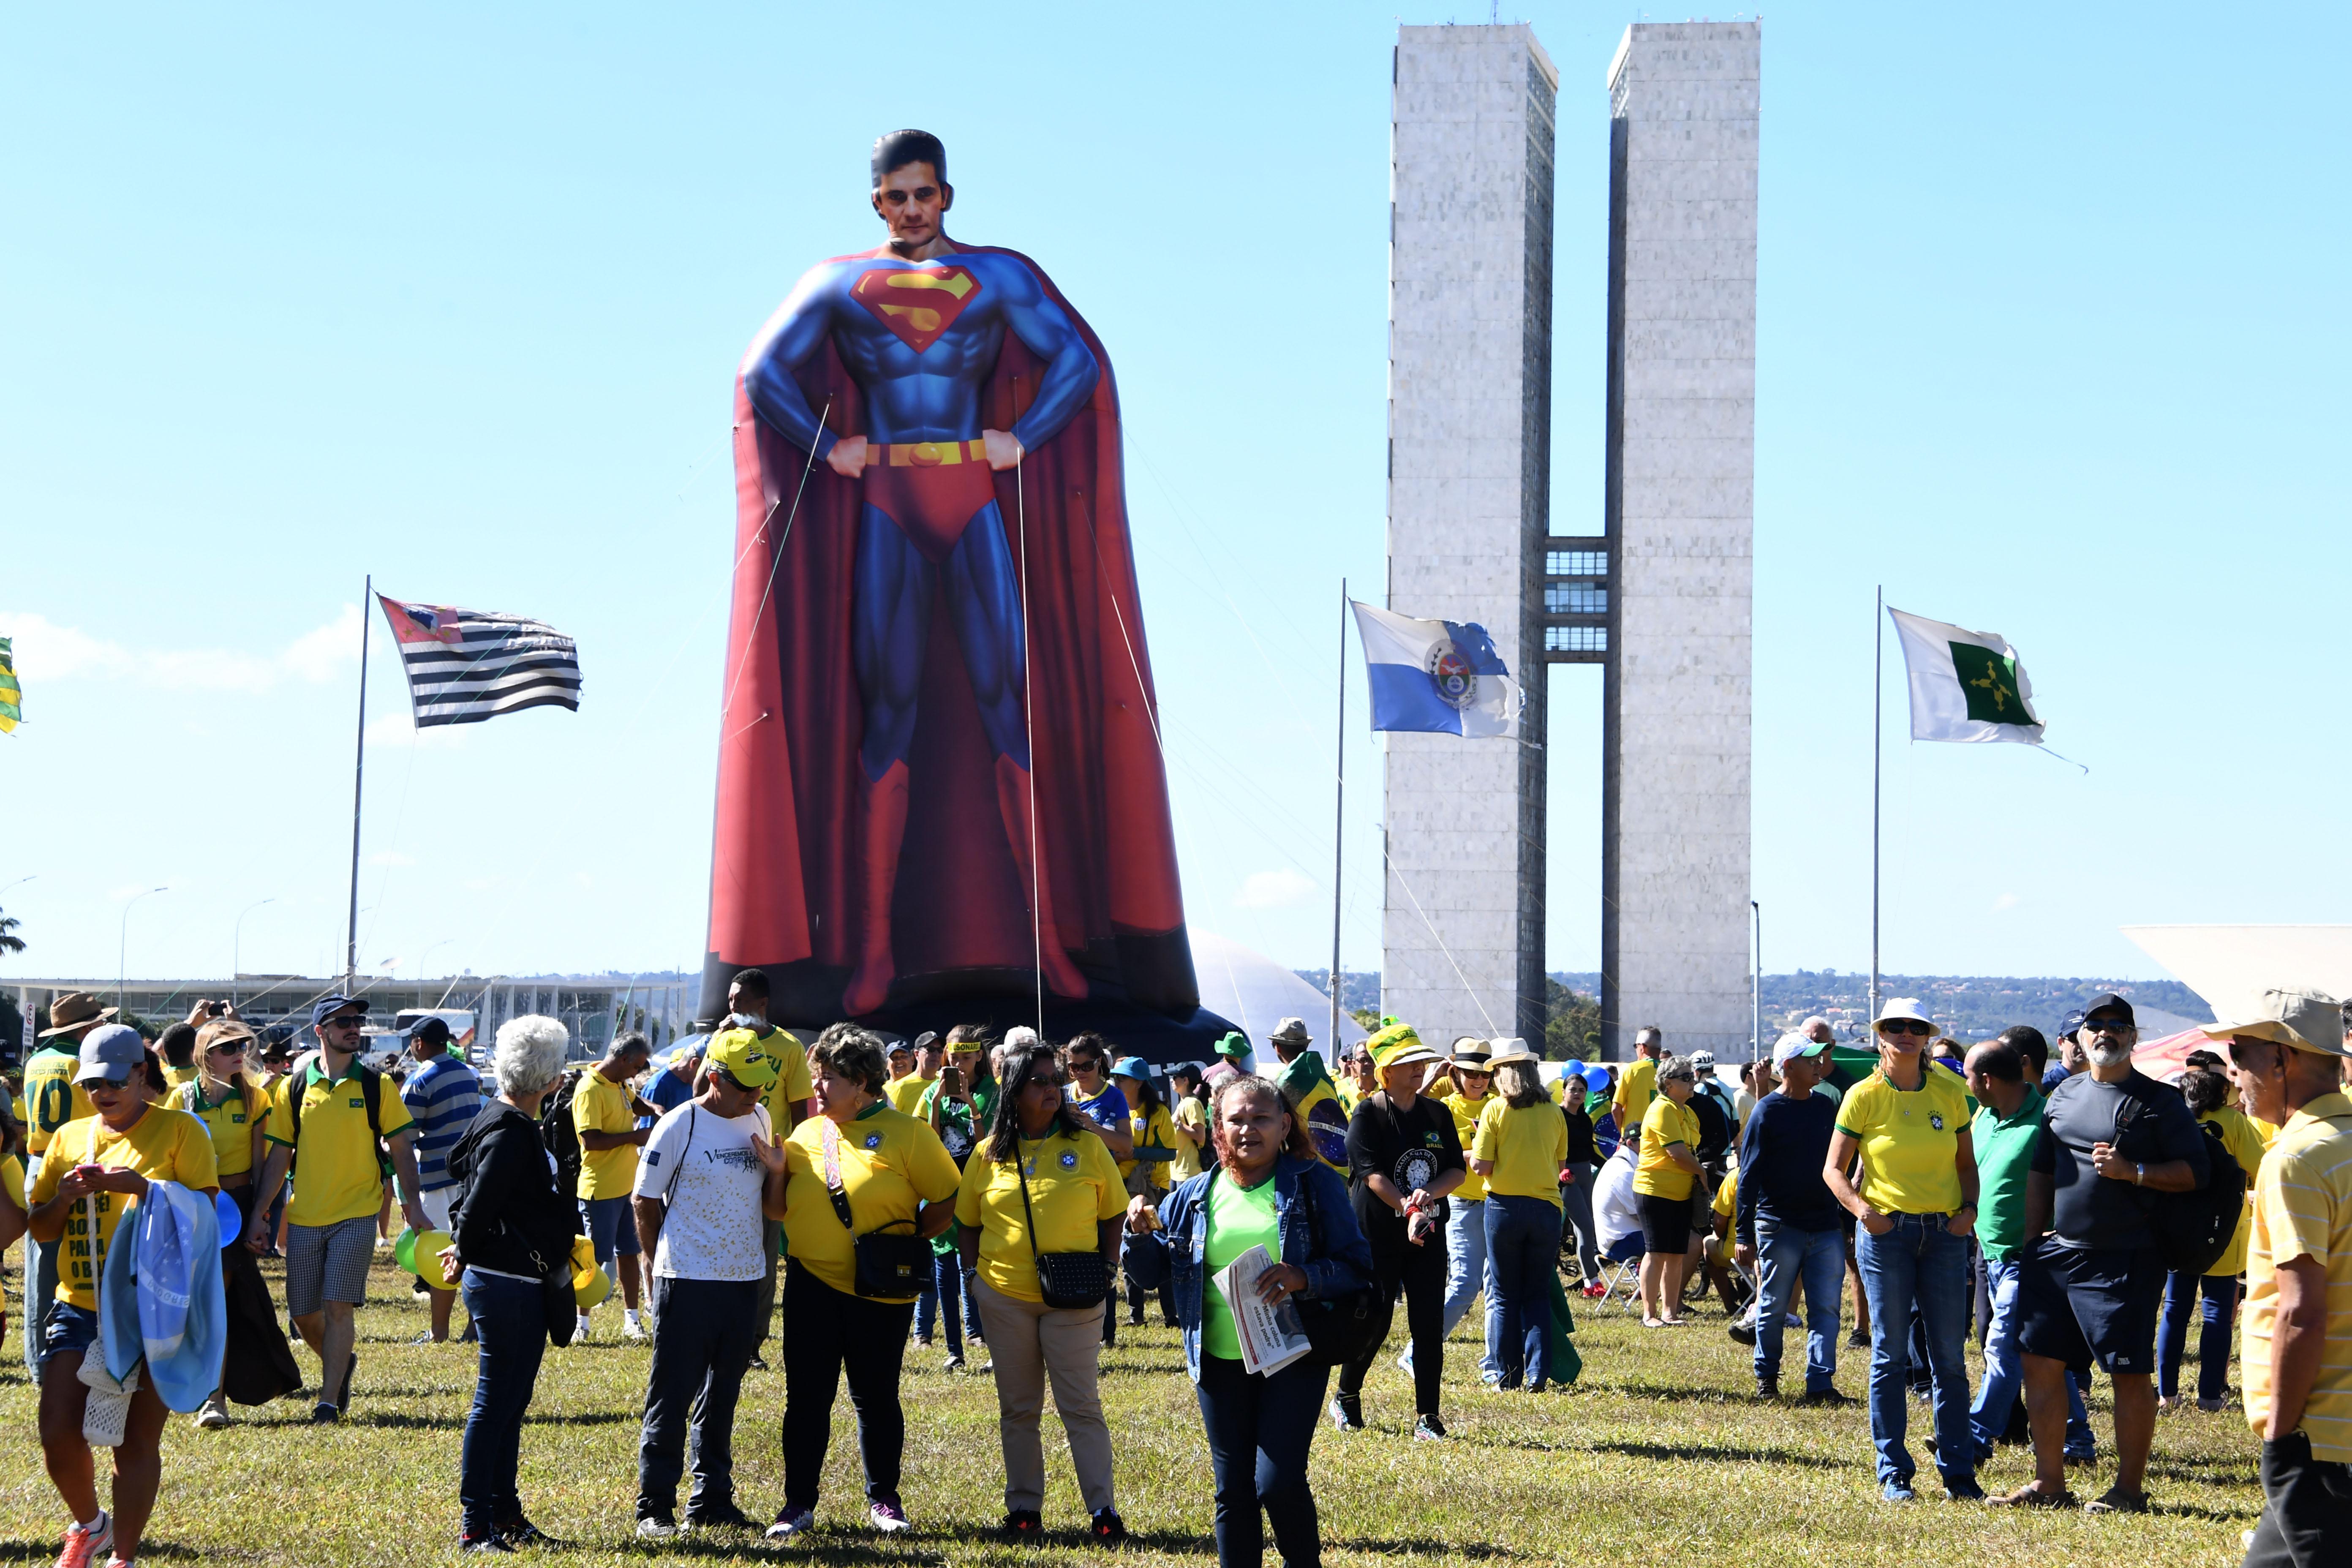 People demonstrate in support of Brazilian president Jair Bolsonaro and Justice Minister Sergio Moro in Brasilia, on June 30, 2019.